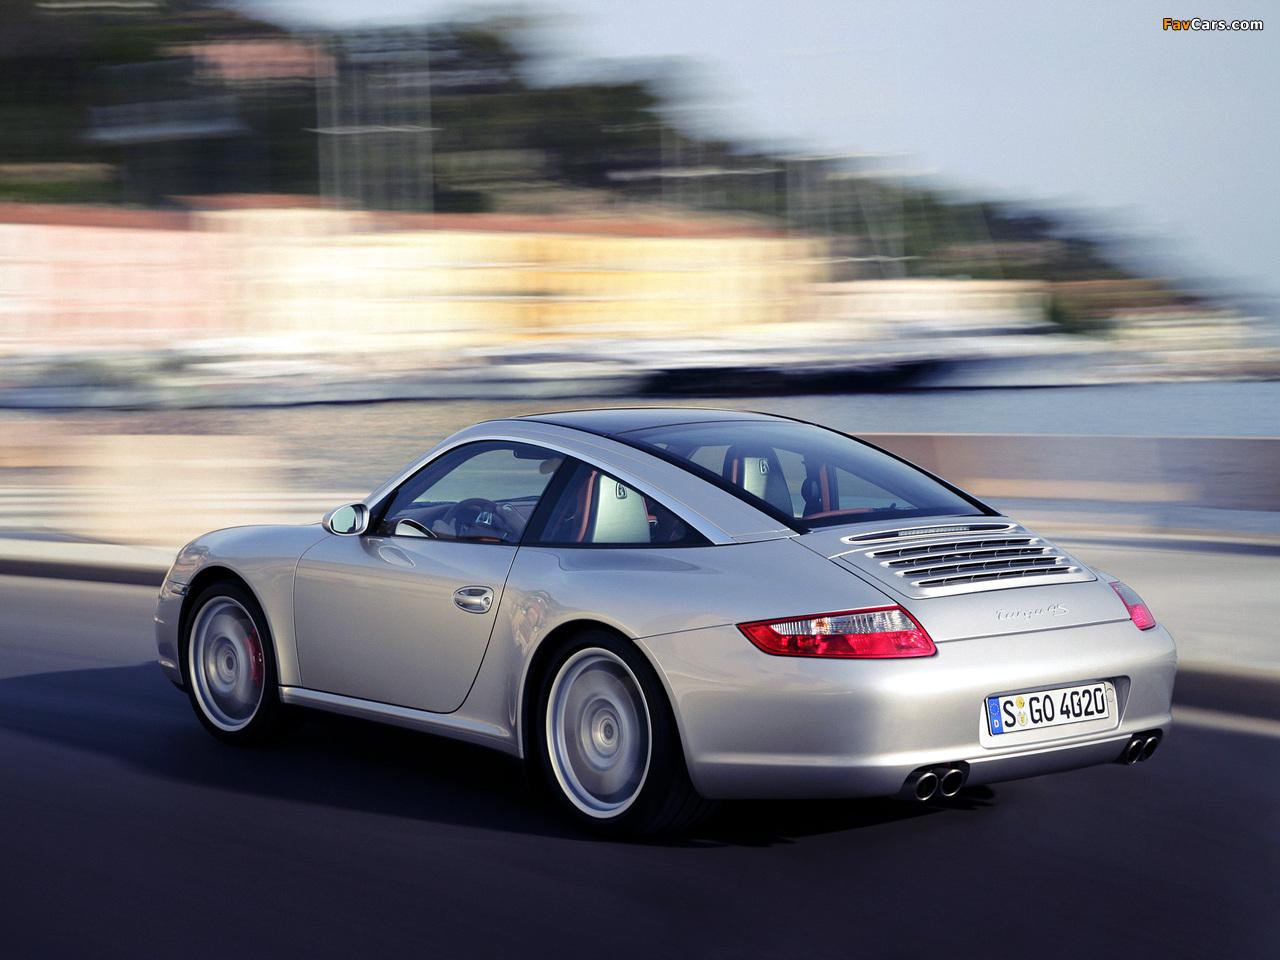 Porsche 911 Targa 4s 997 2005 08 Images 1280x960